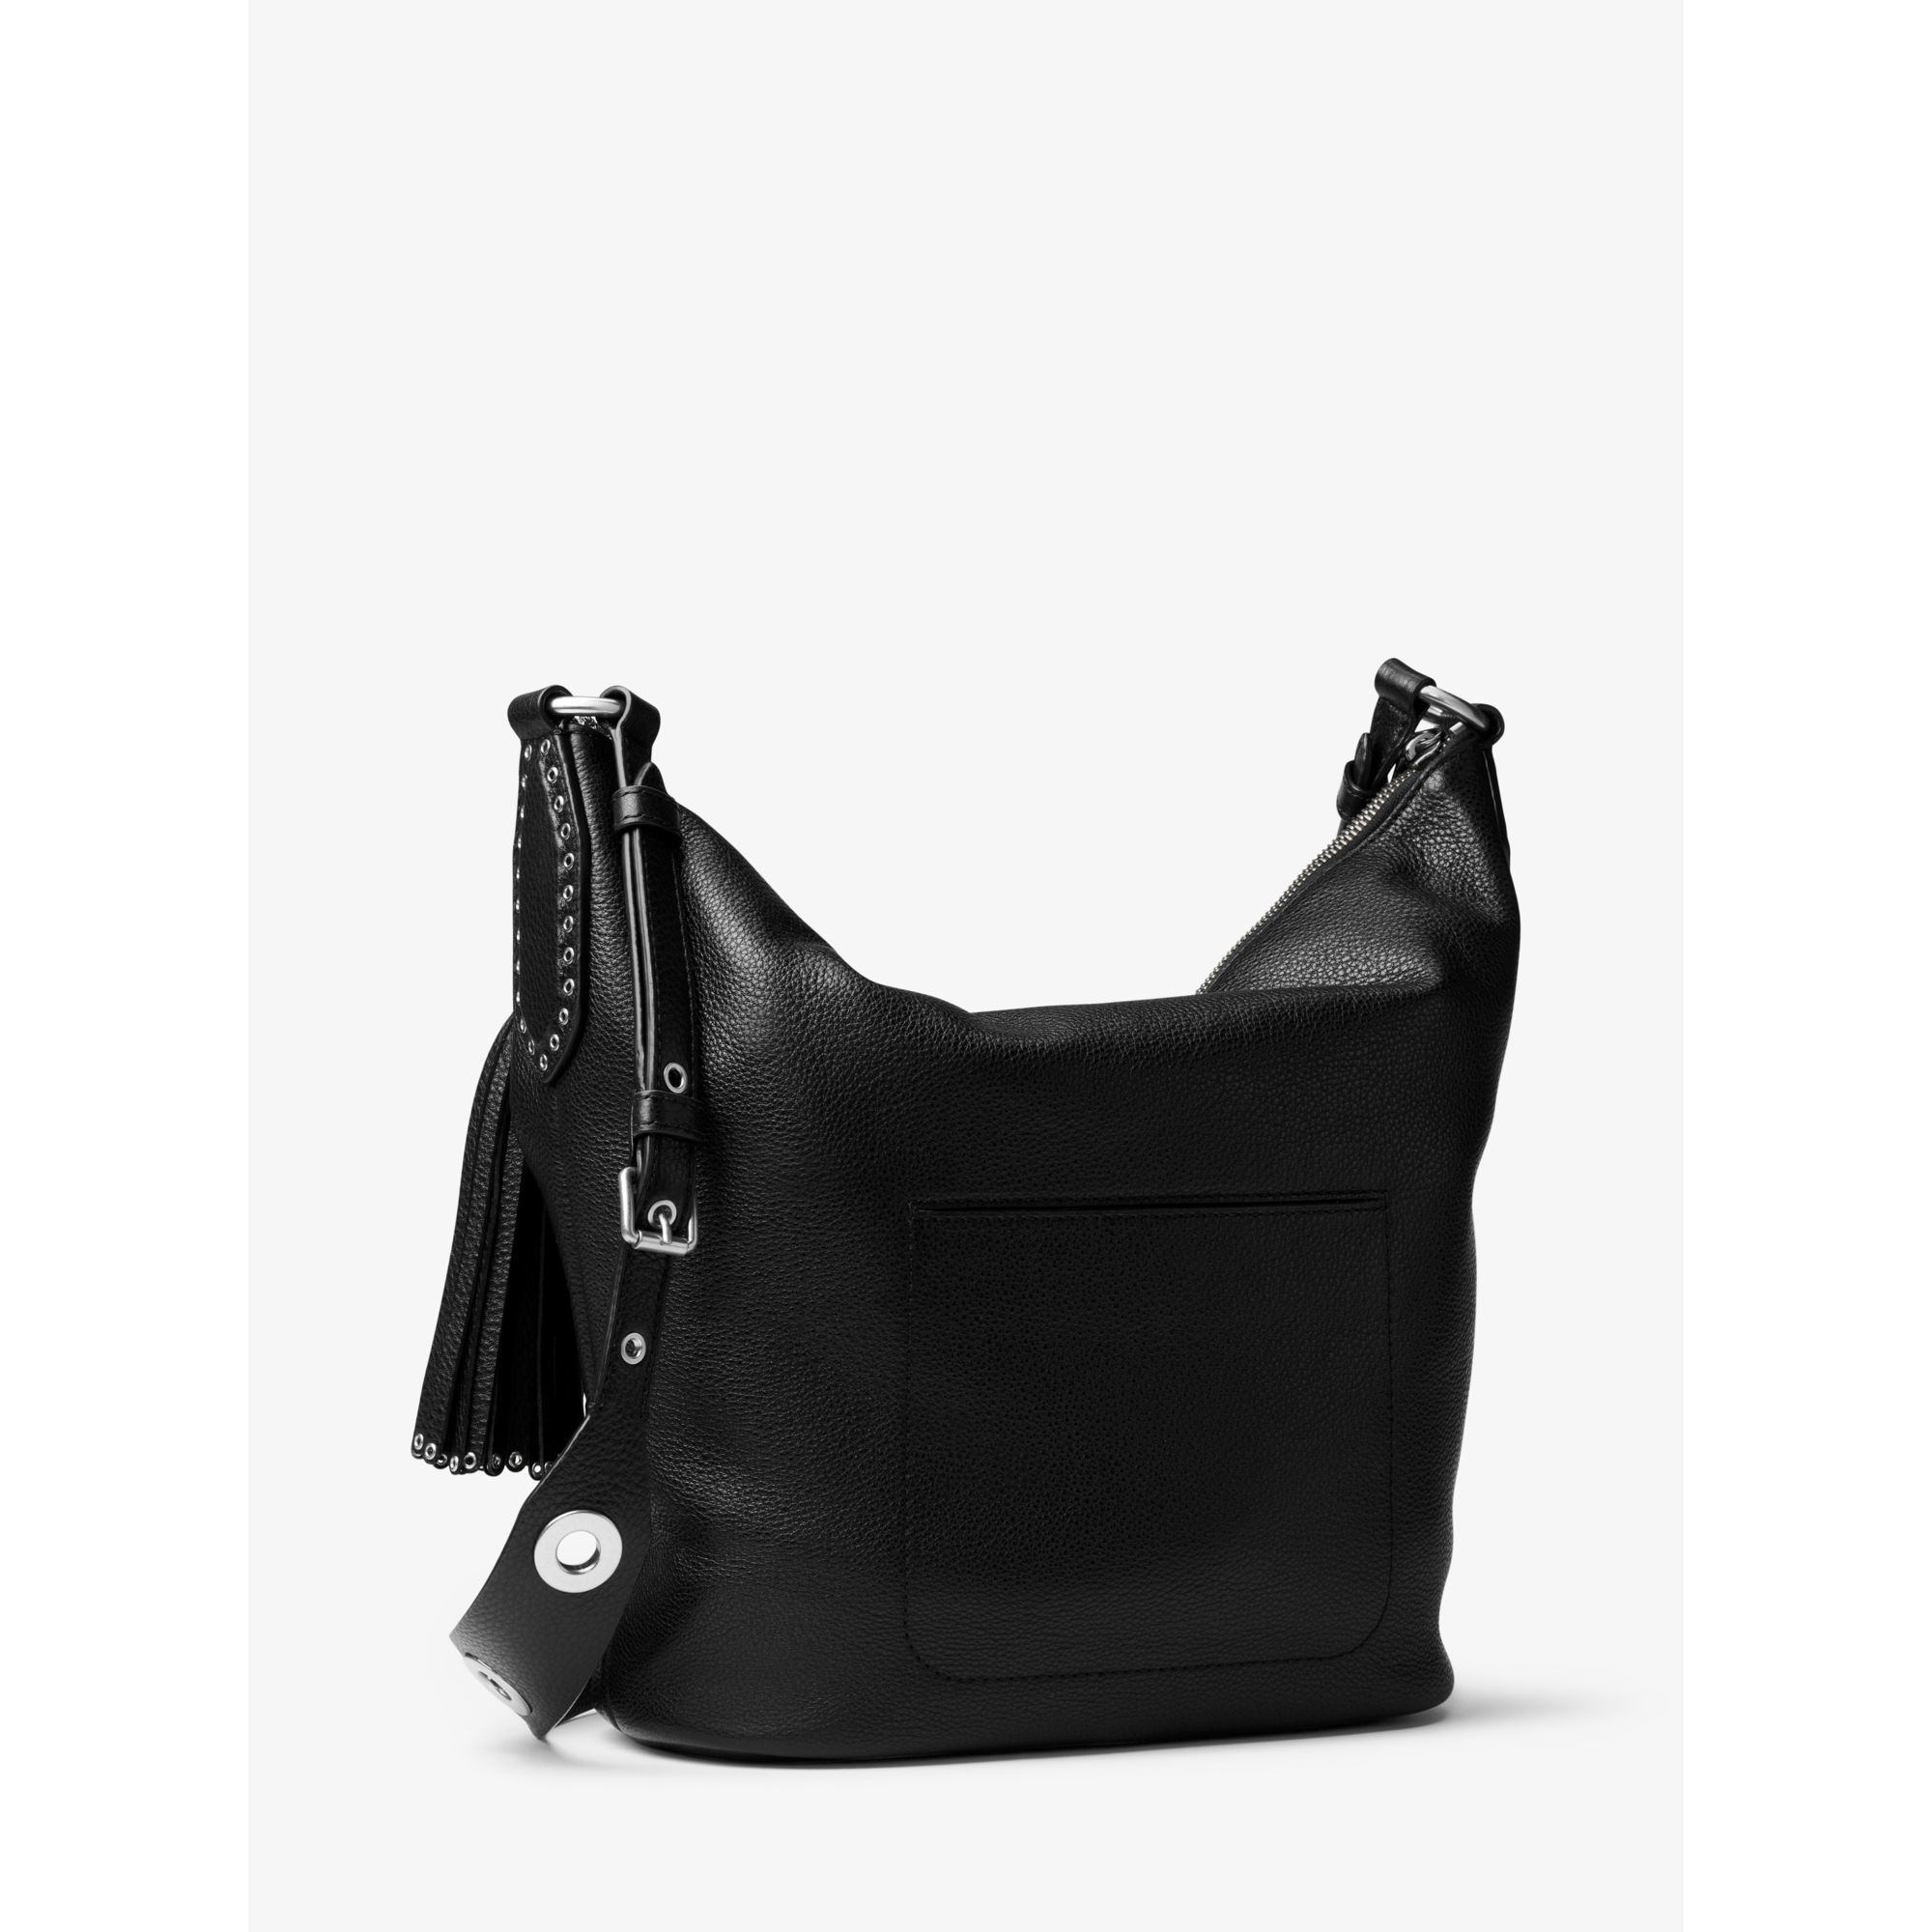 b7577eea12f6 Lyst - Michael Kors Brooklyn Large Leather Feed Bag in Black